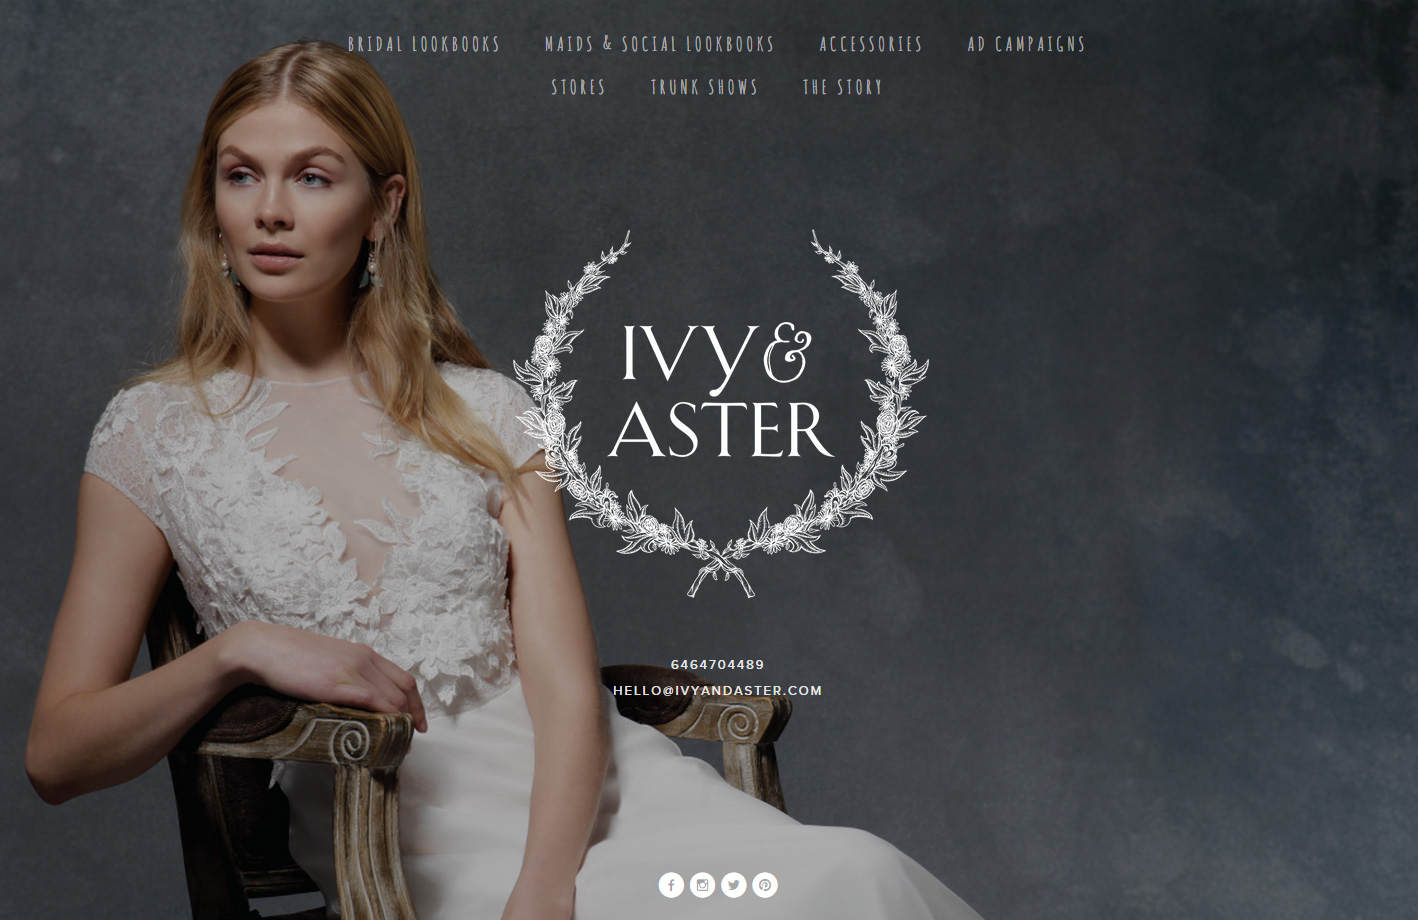 "<a href=""http://ivyandaster.com"">Ivy & Aster →</a>"